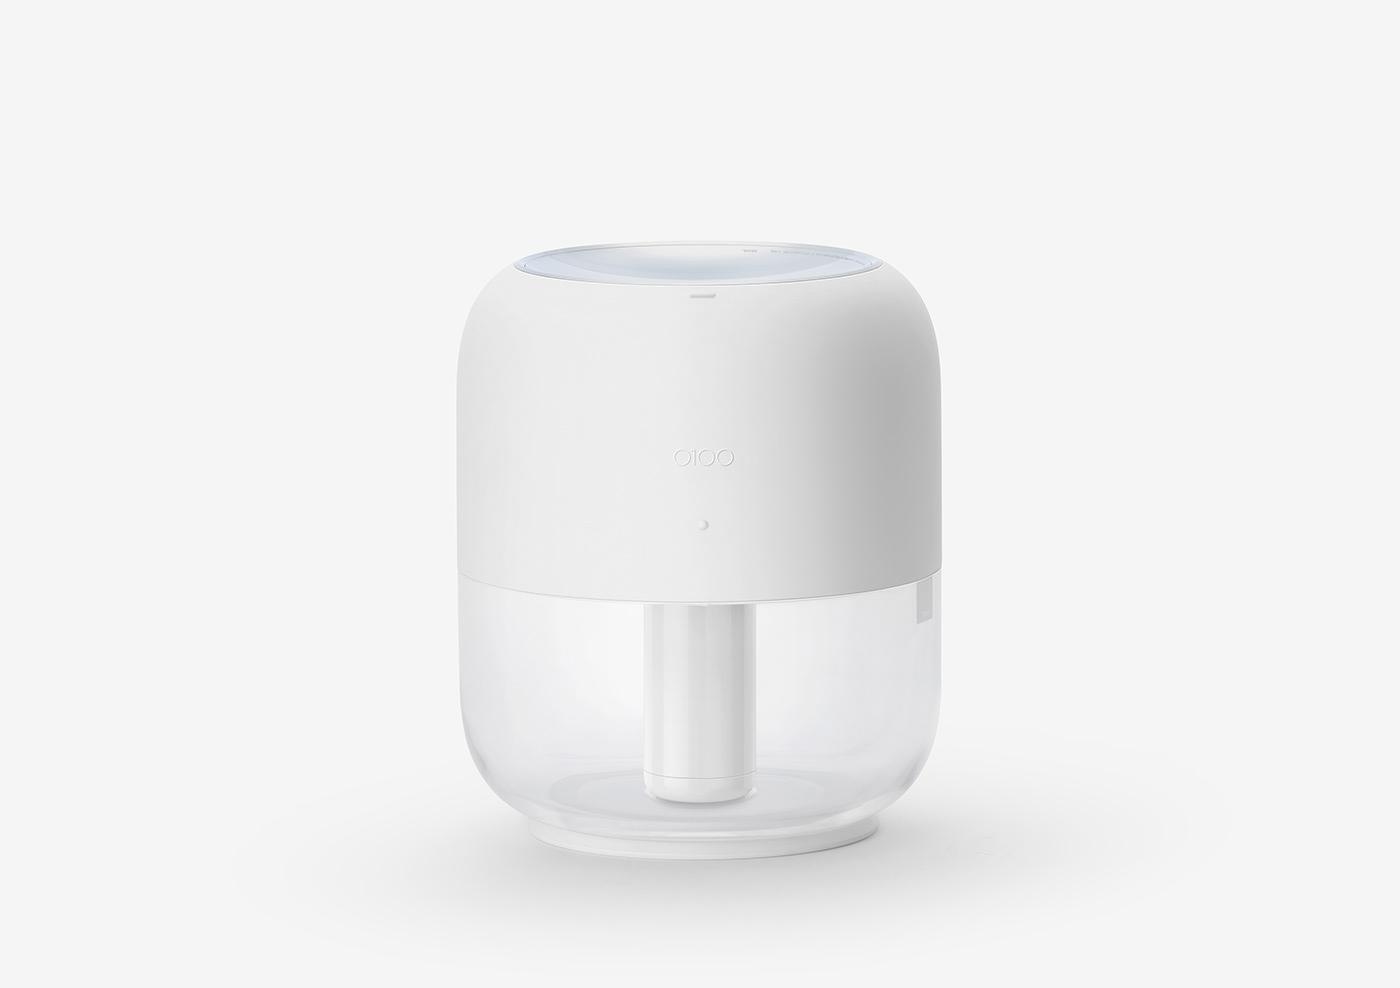 humidifier water if design award industrial design  product design  photograph Design Inspiration 디자인 스튜디오 산업디자인 제픔디자인 스튜디오